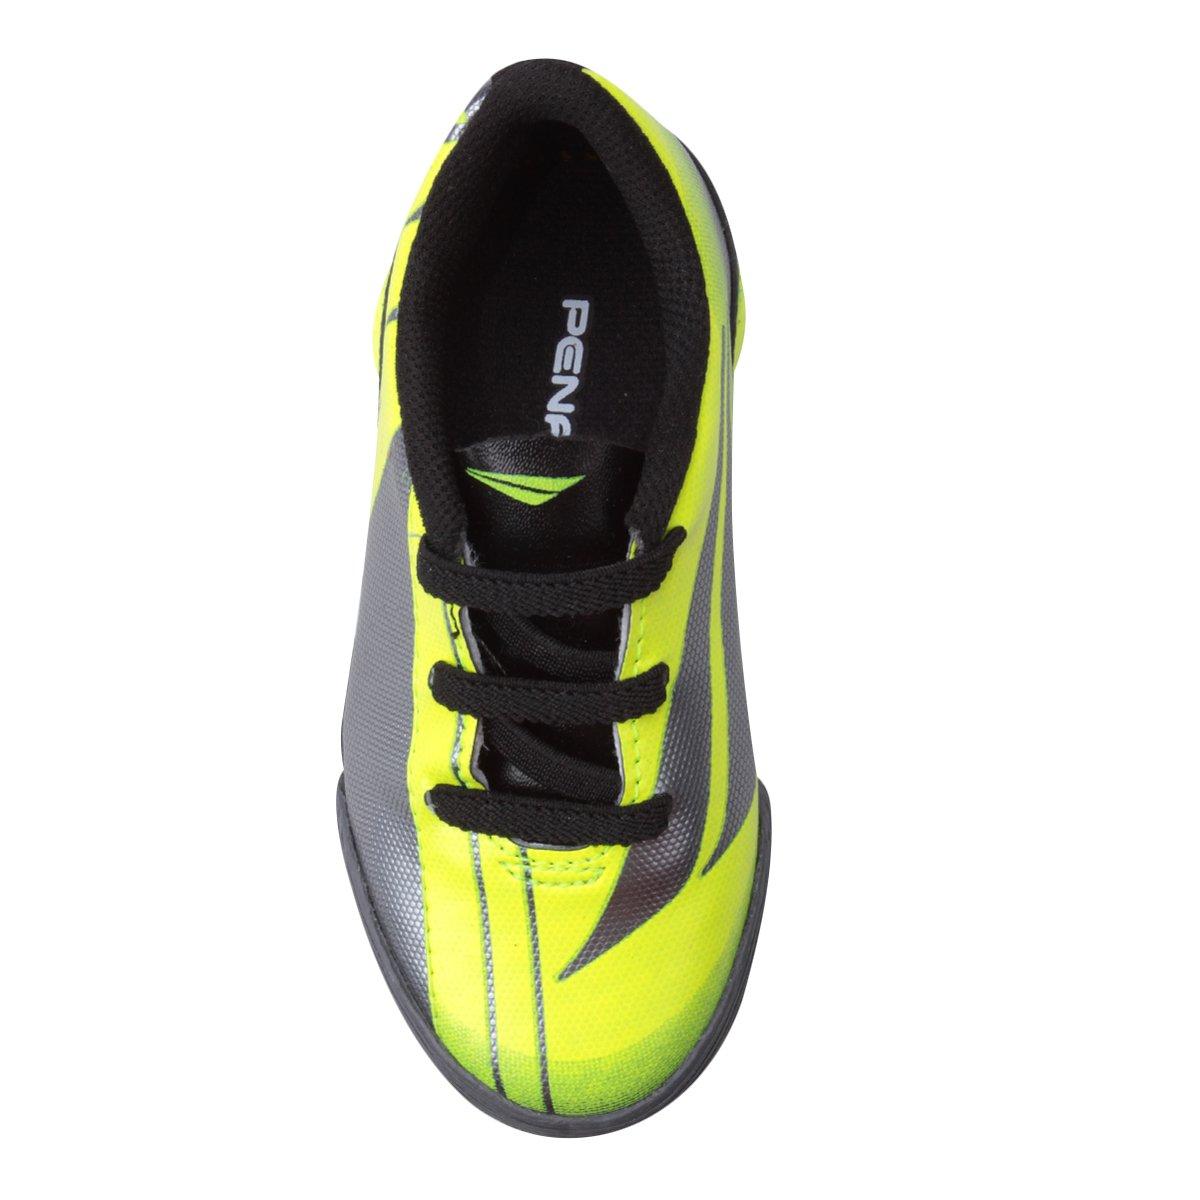 Chuteira Futsal Infantil Penalty ATF K Attom VIII - Cinza e Amarelo ... 3e1dcec7af73e